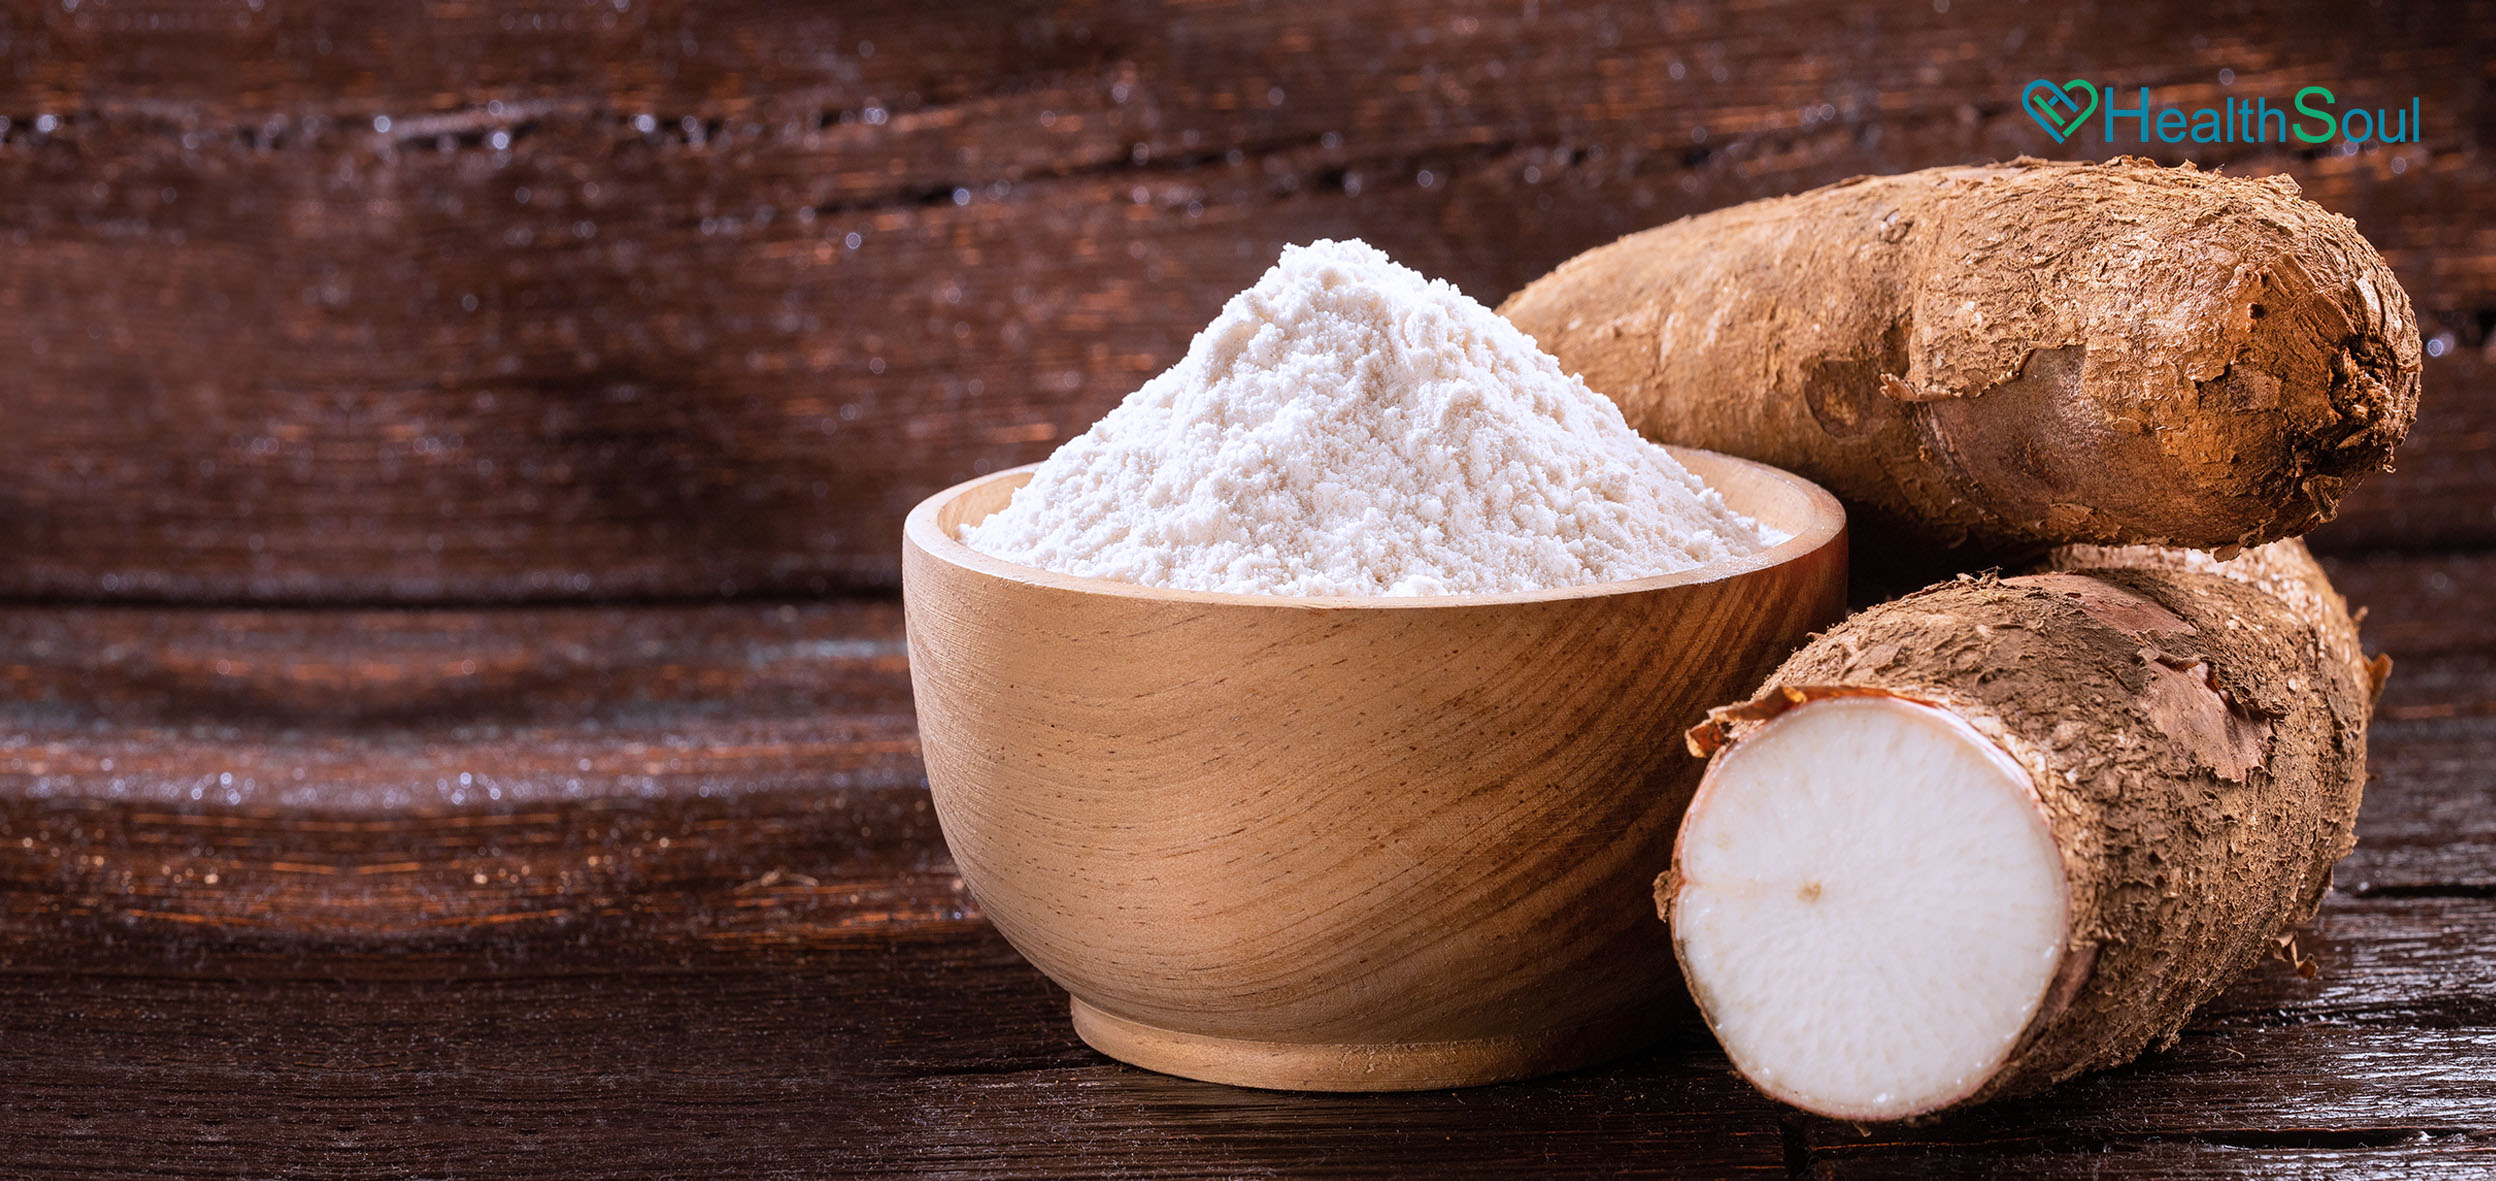 Health benefits of casava flour | HealthSoul